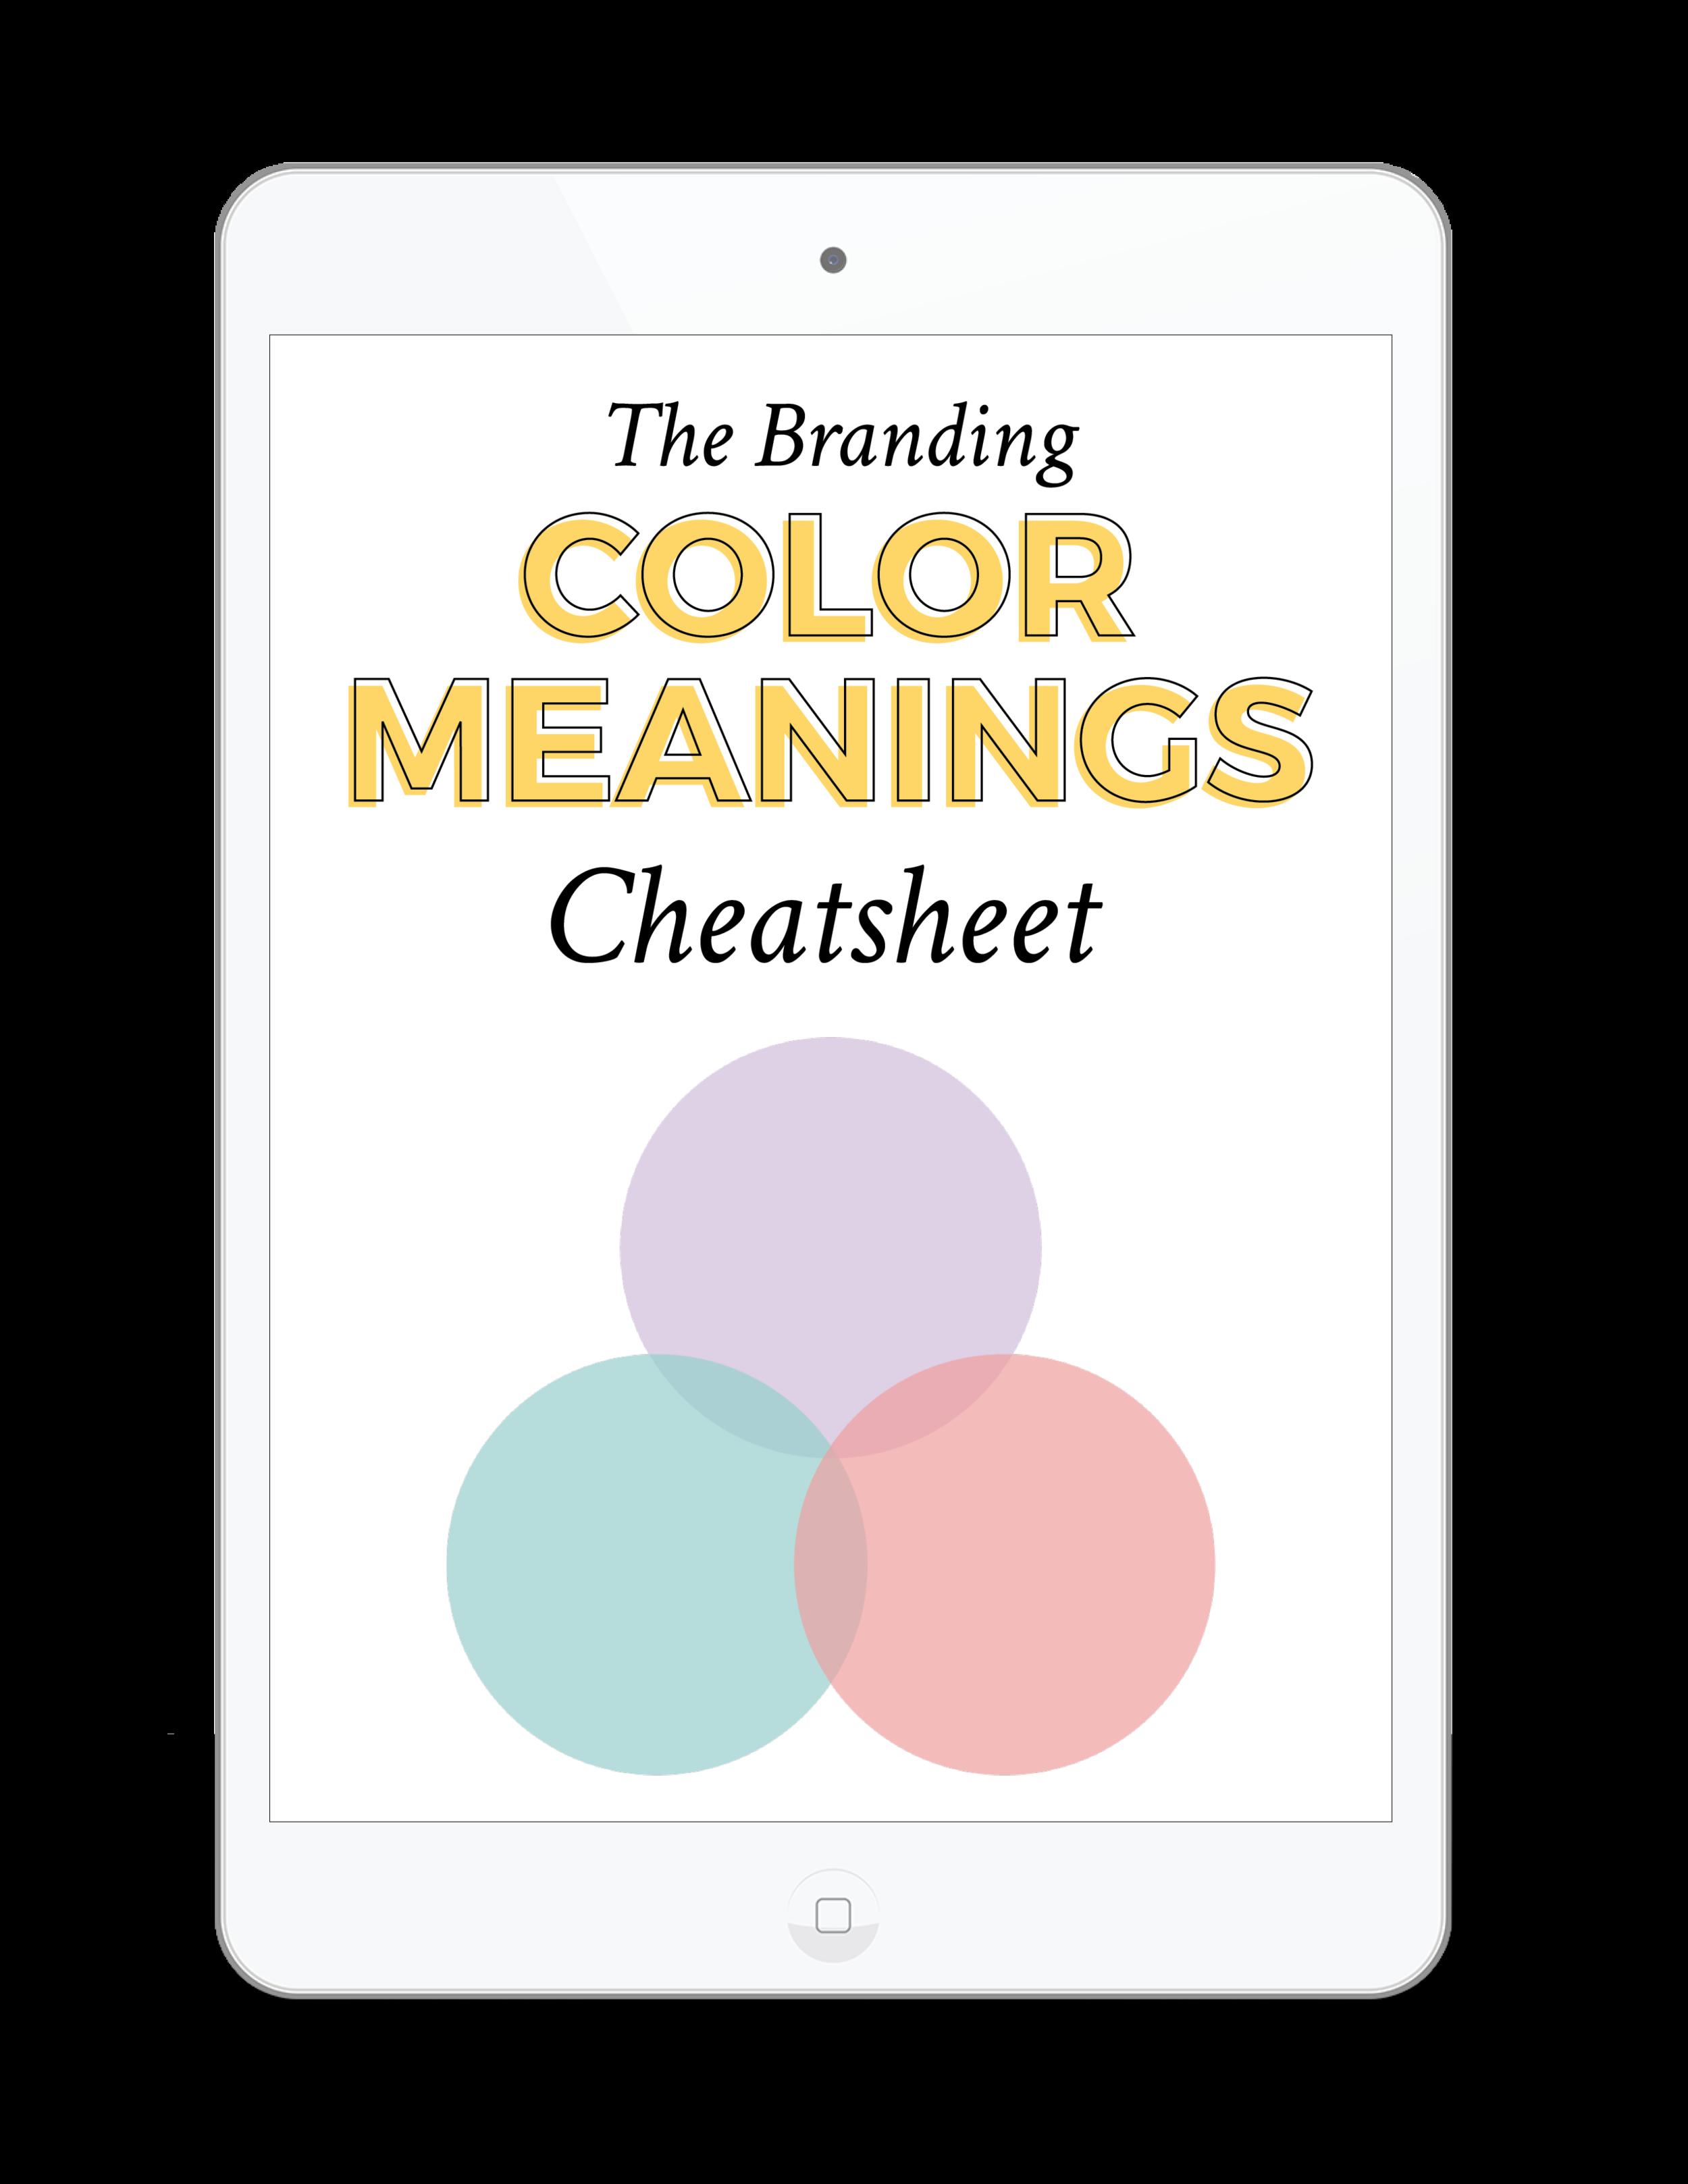 The Branding for Business Color Meanings Cheatsheet | viaYuri.com